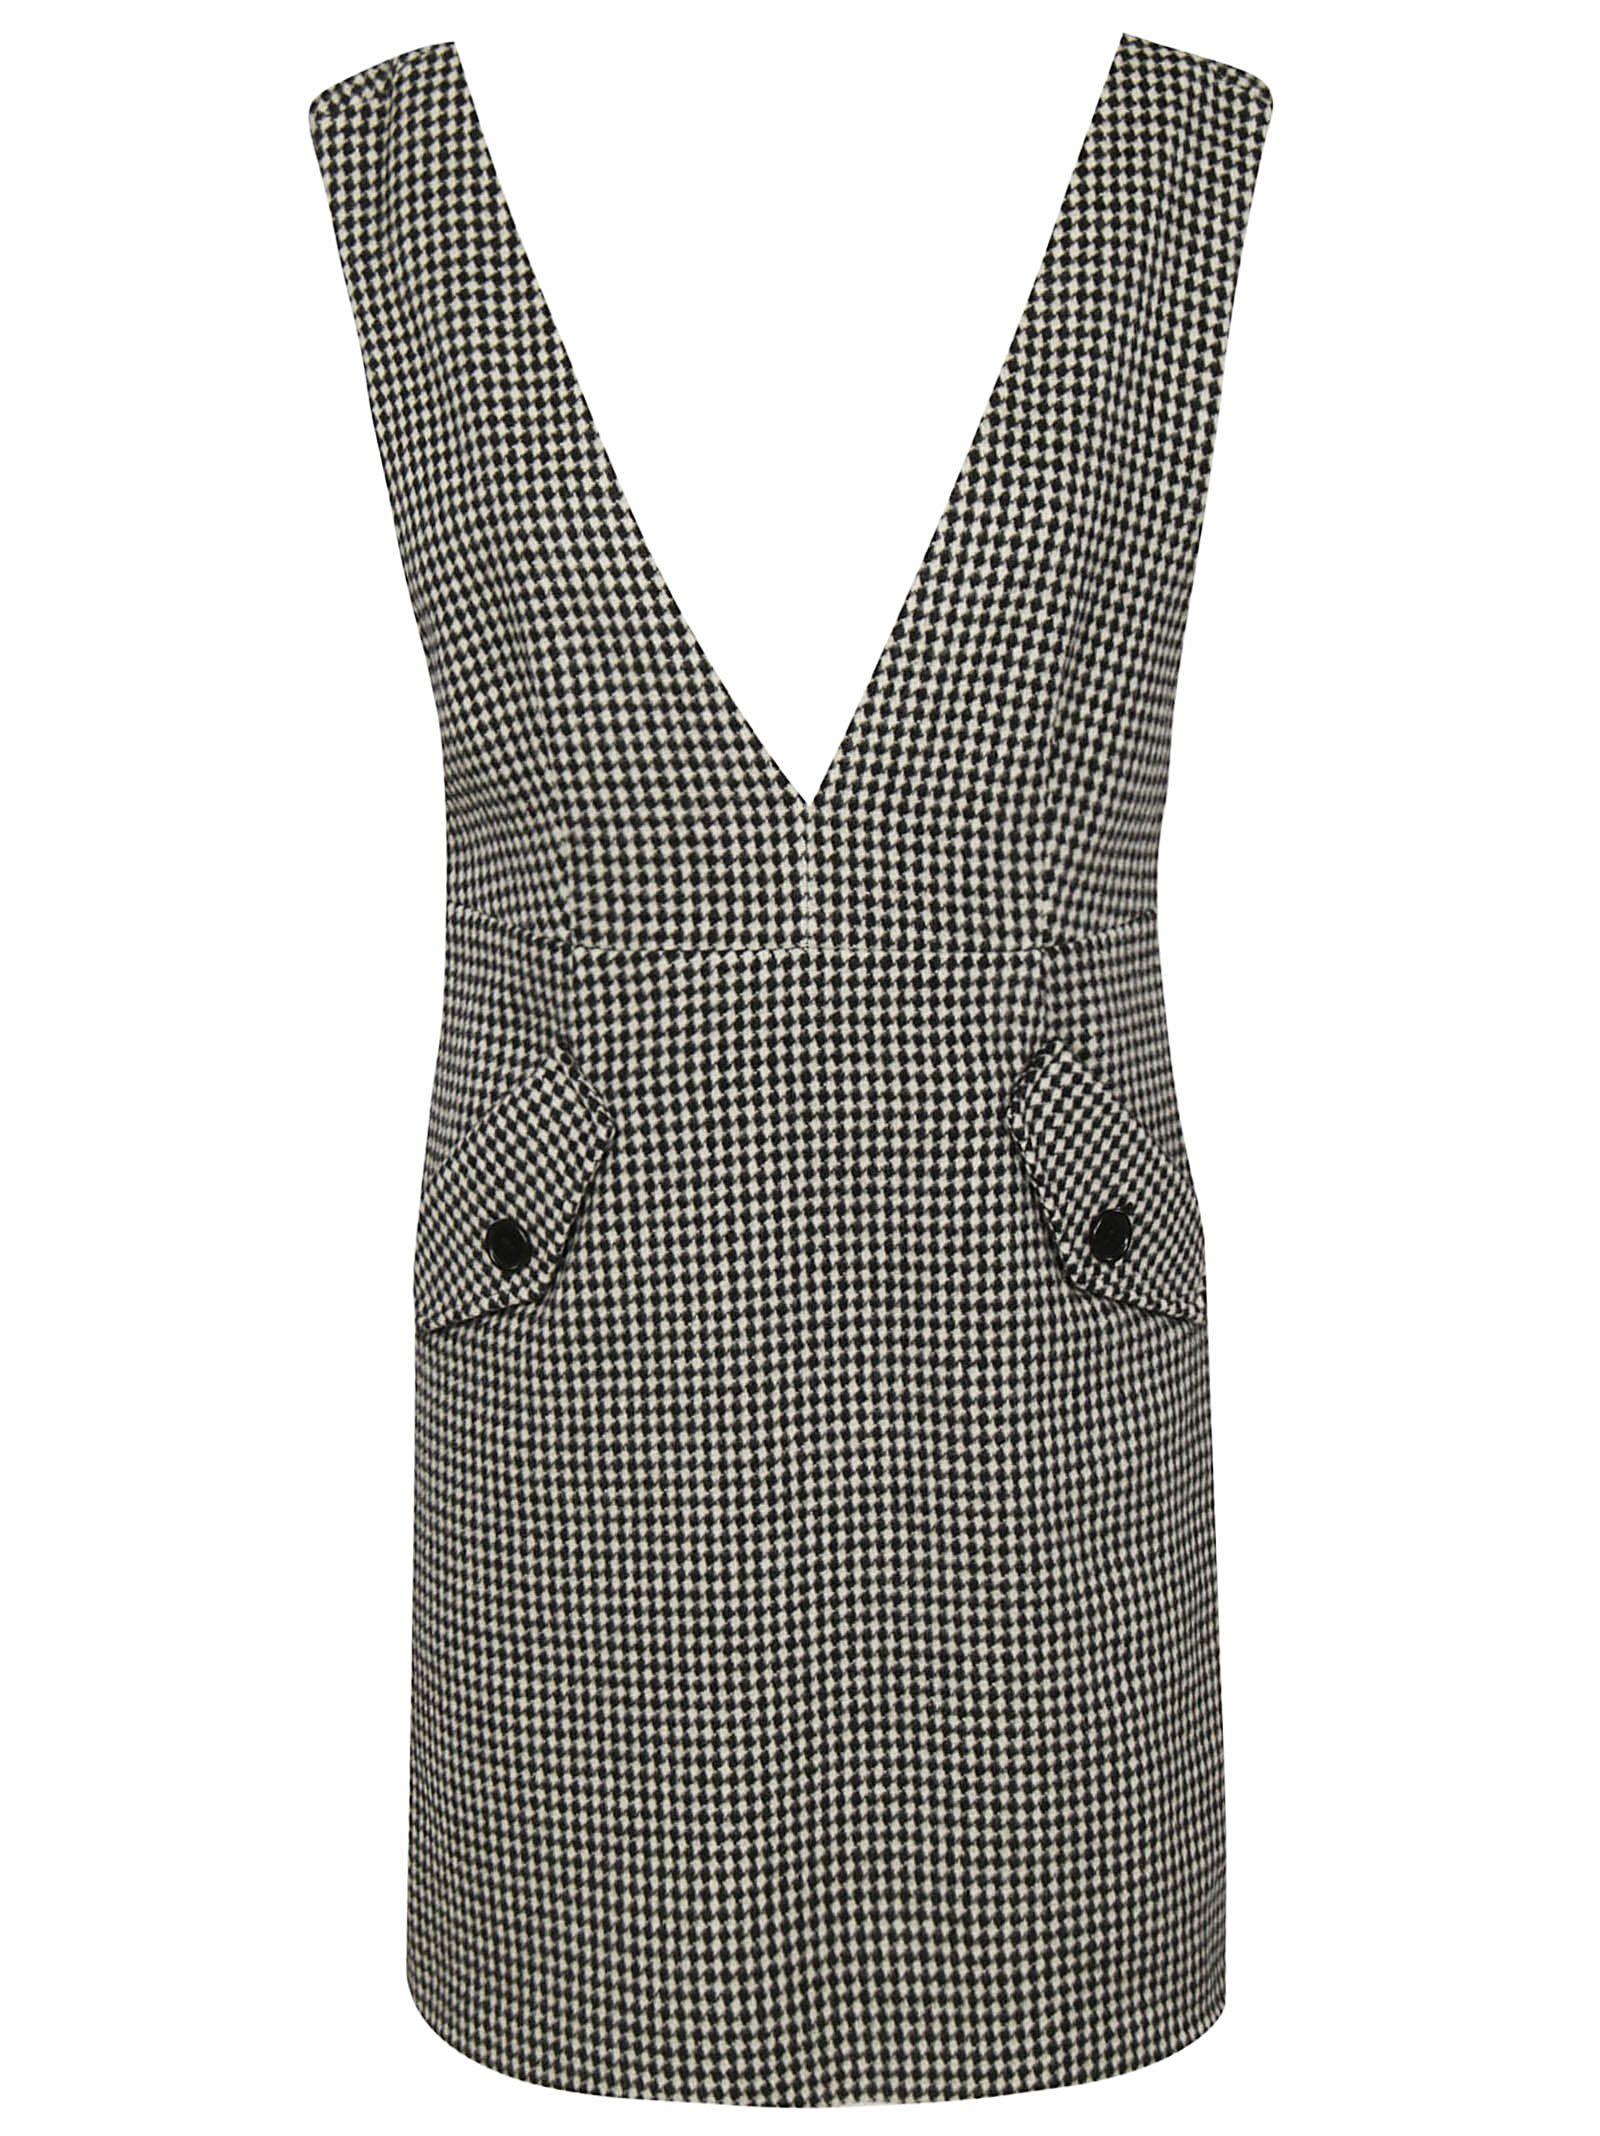 TARA JARMON Checked Dress in Noir